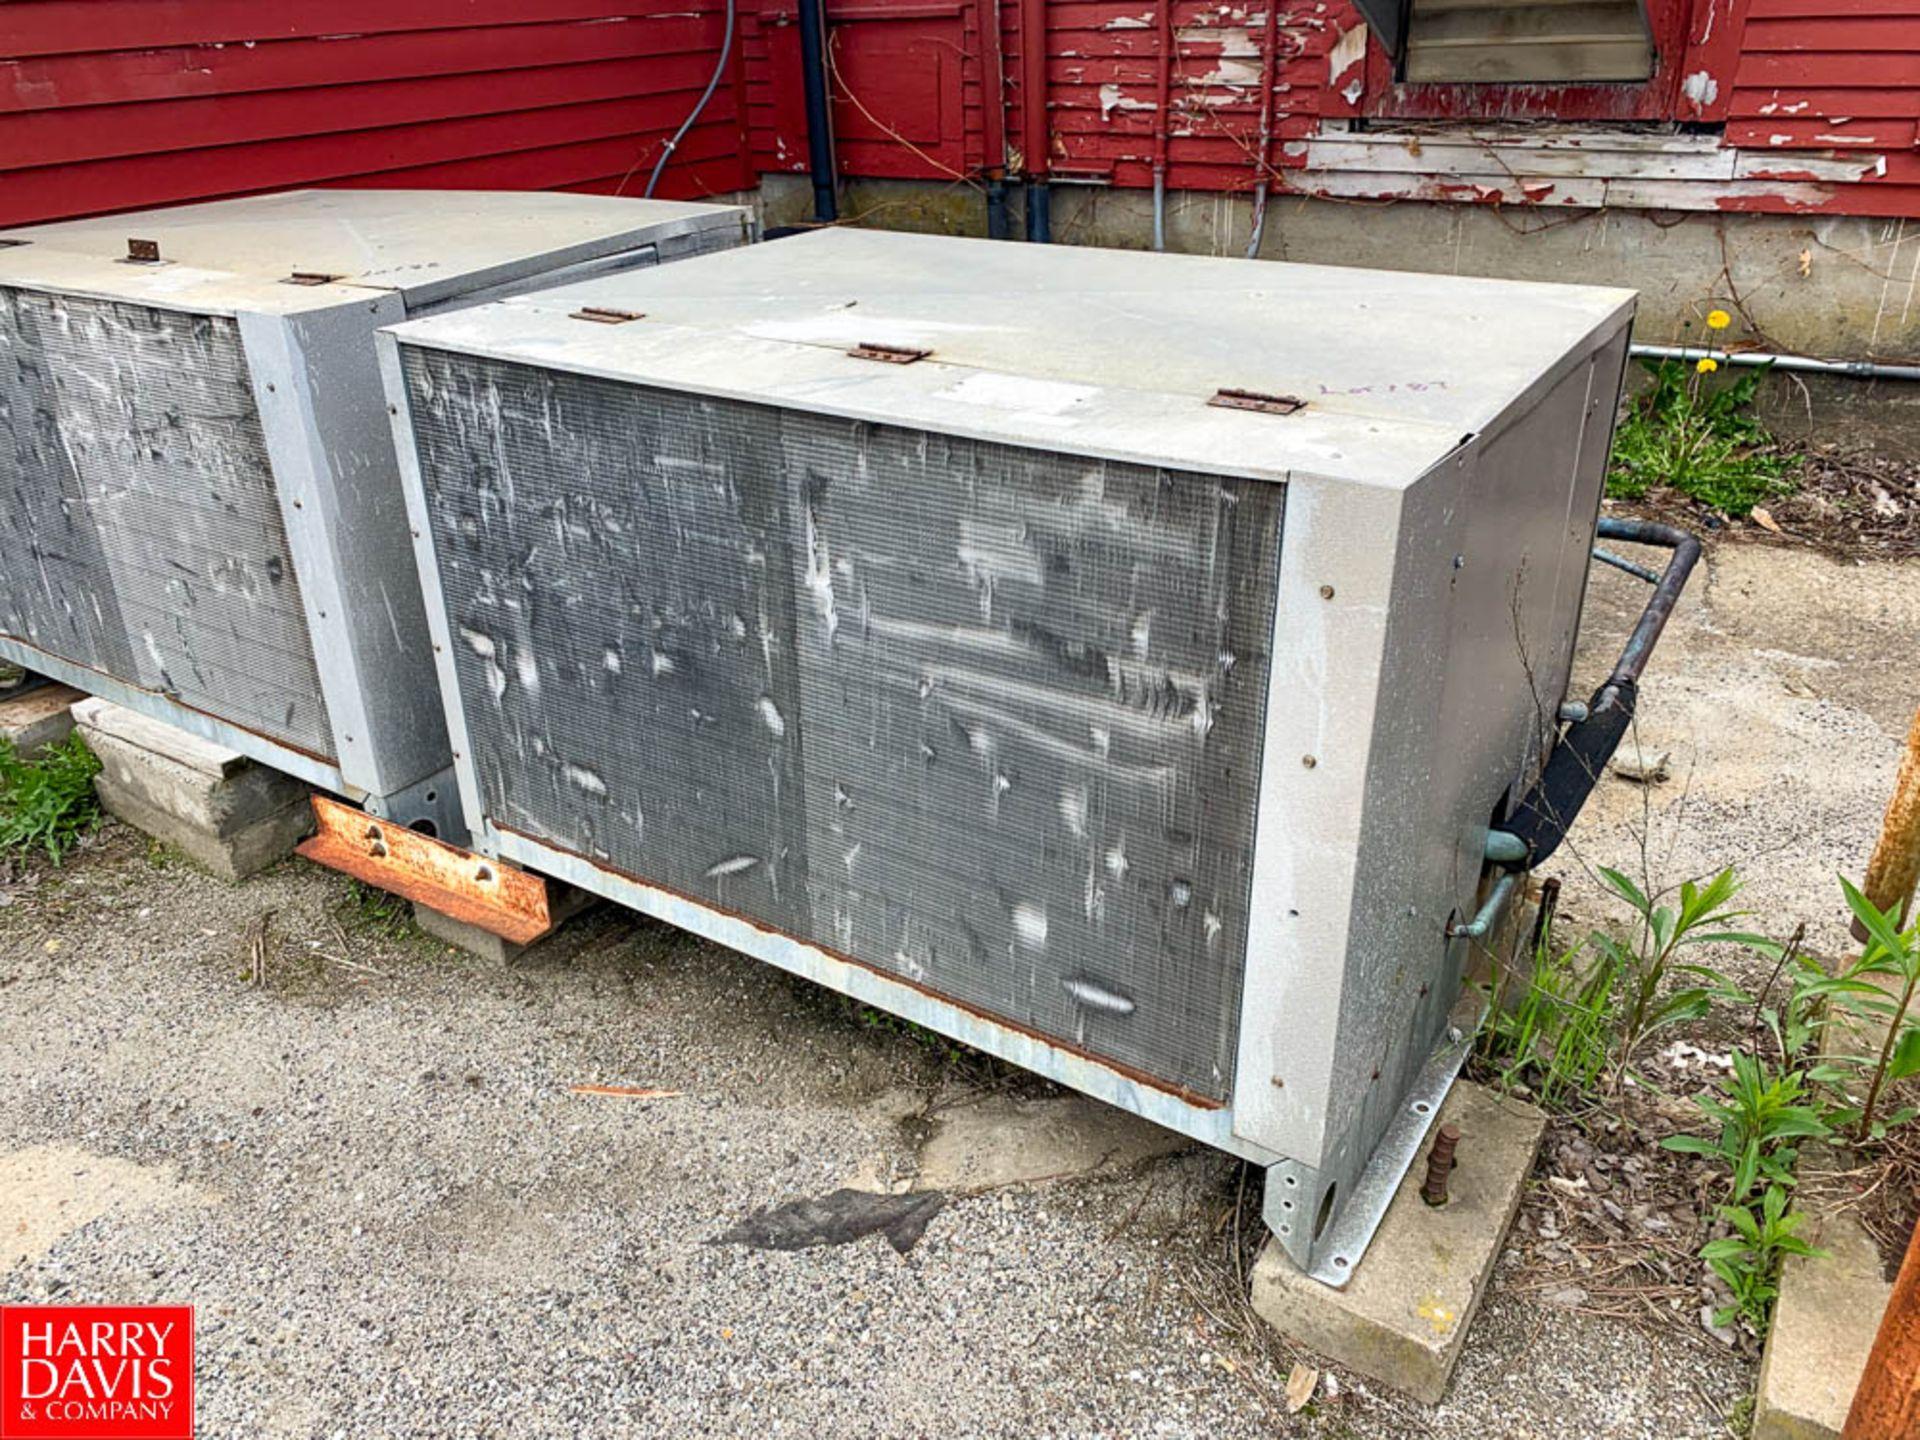 Freon Compressor Unit and Evaporator